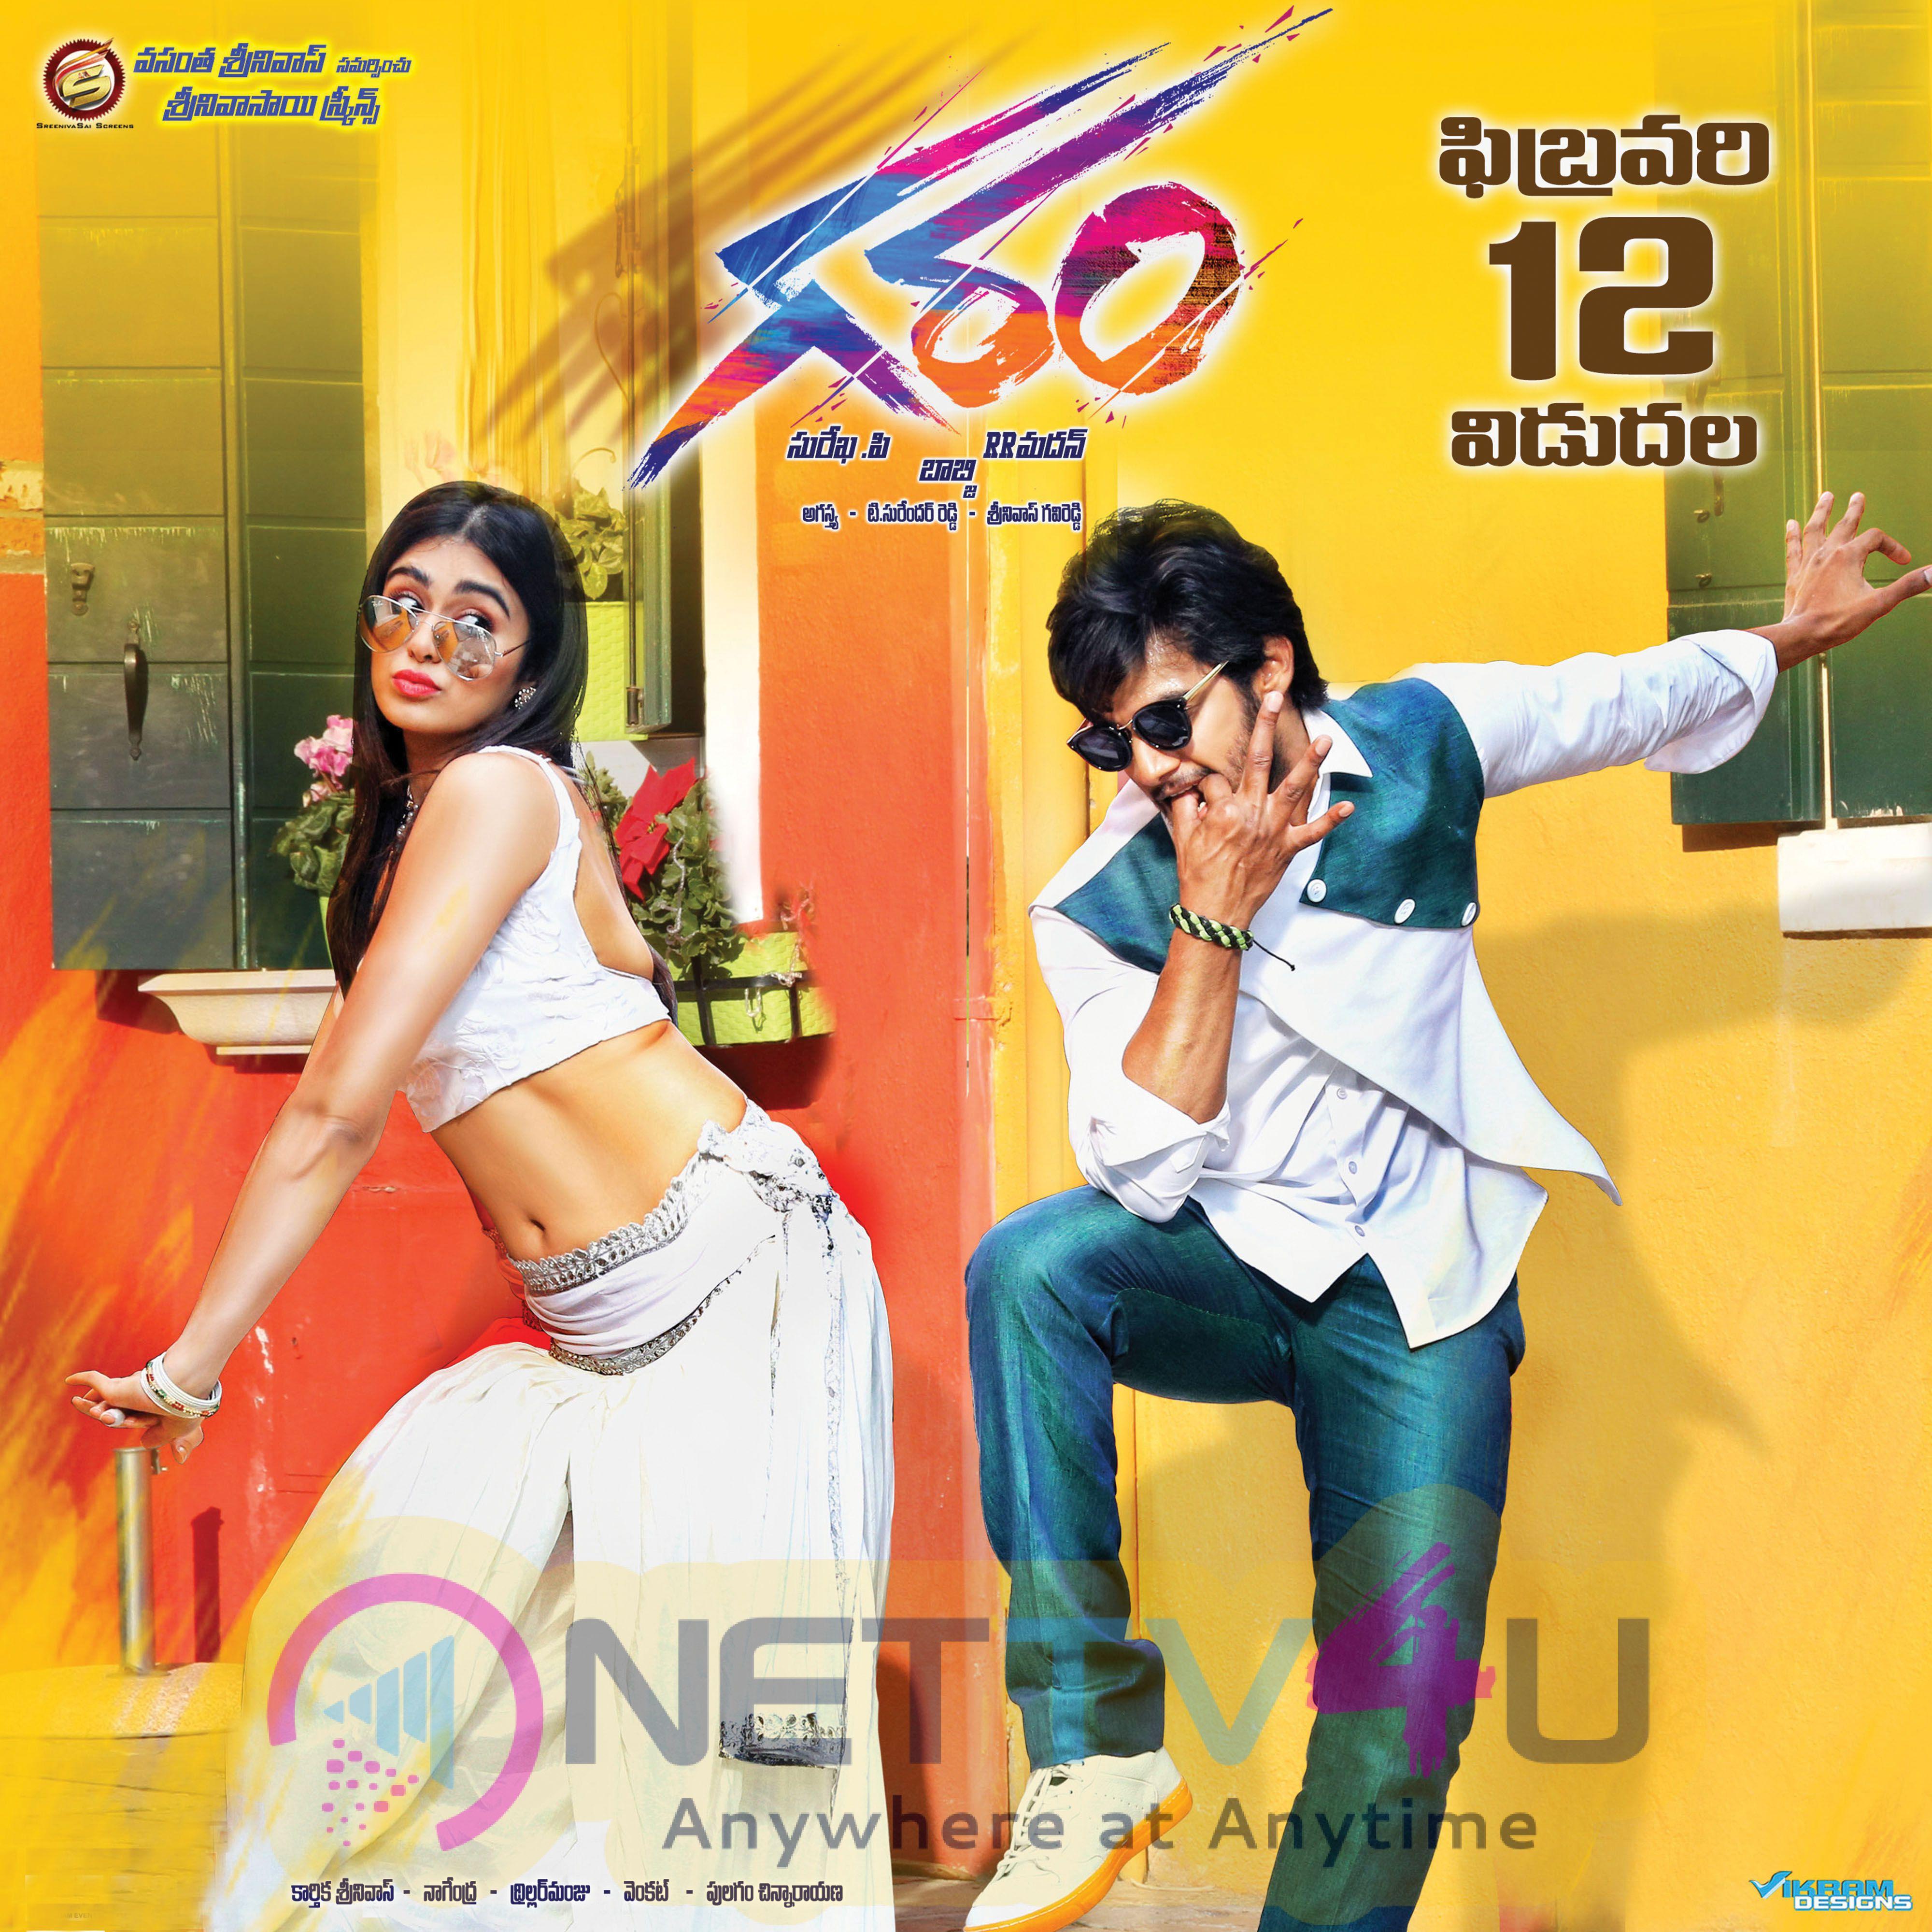 Garam Telugu Movie HD Wallpapers